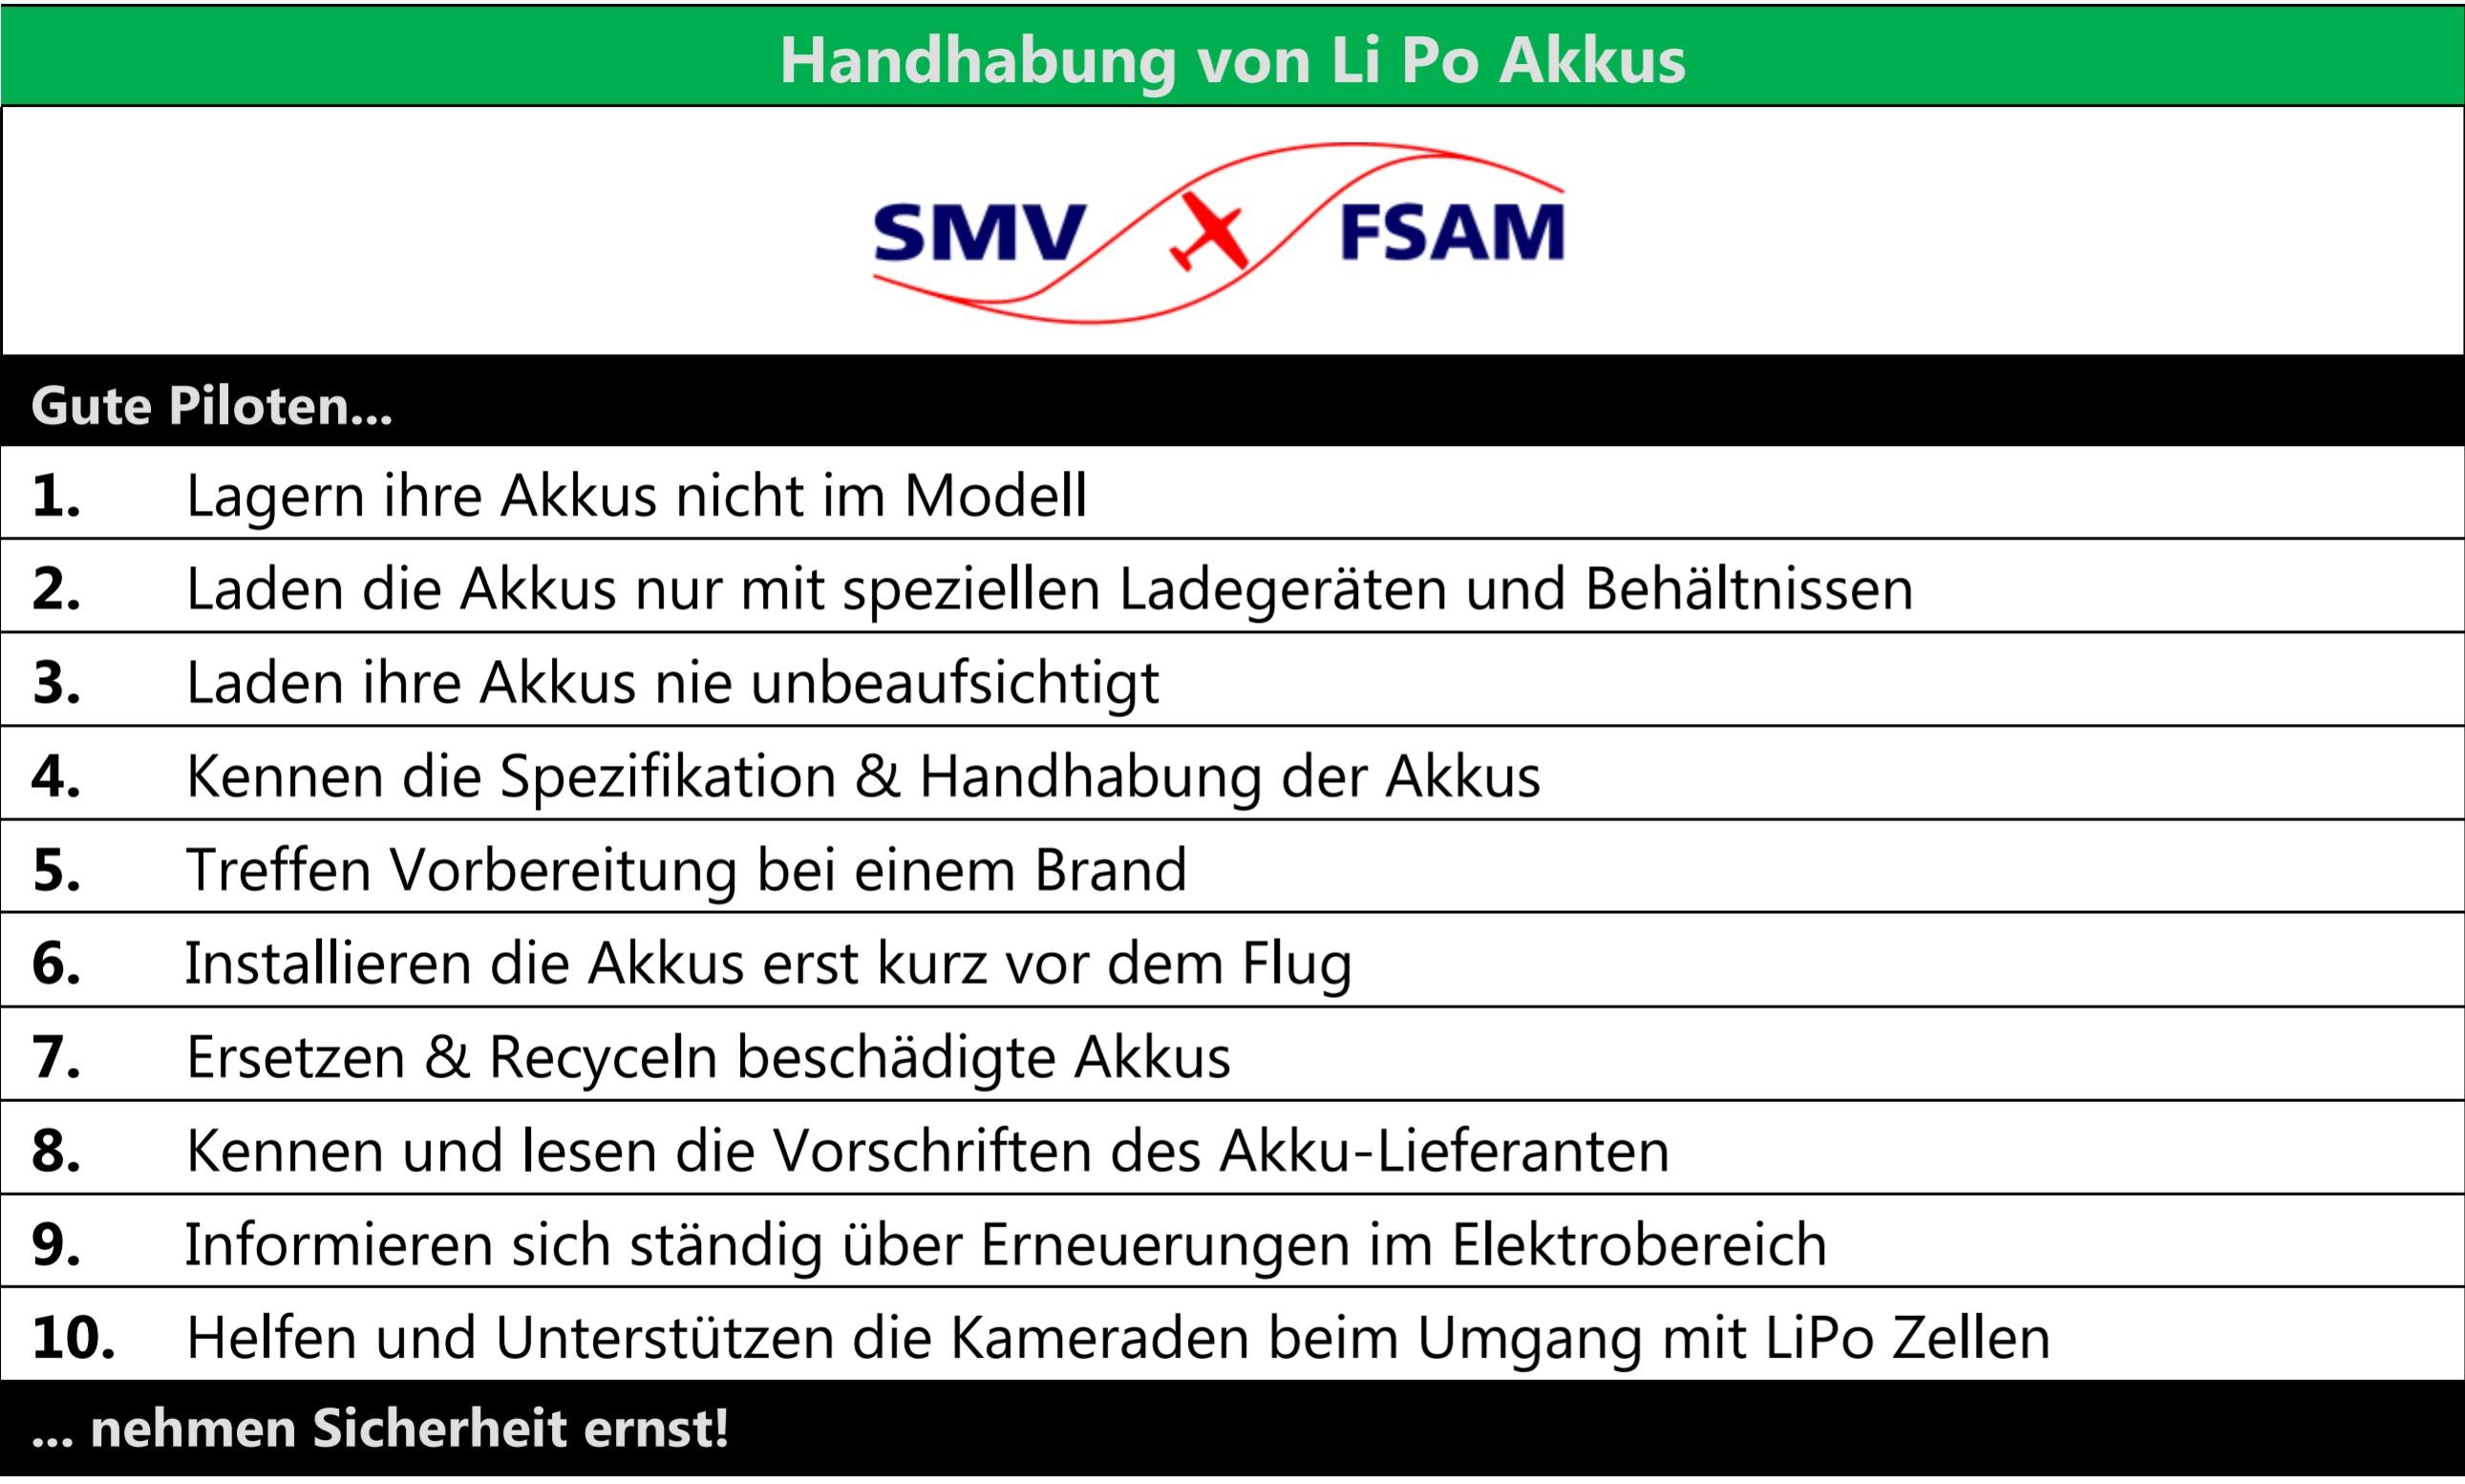 Checkliste Handhabung von Li Po Akkus im Modellflug